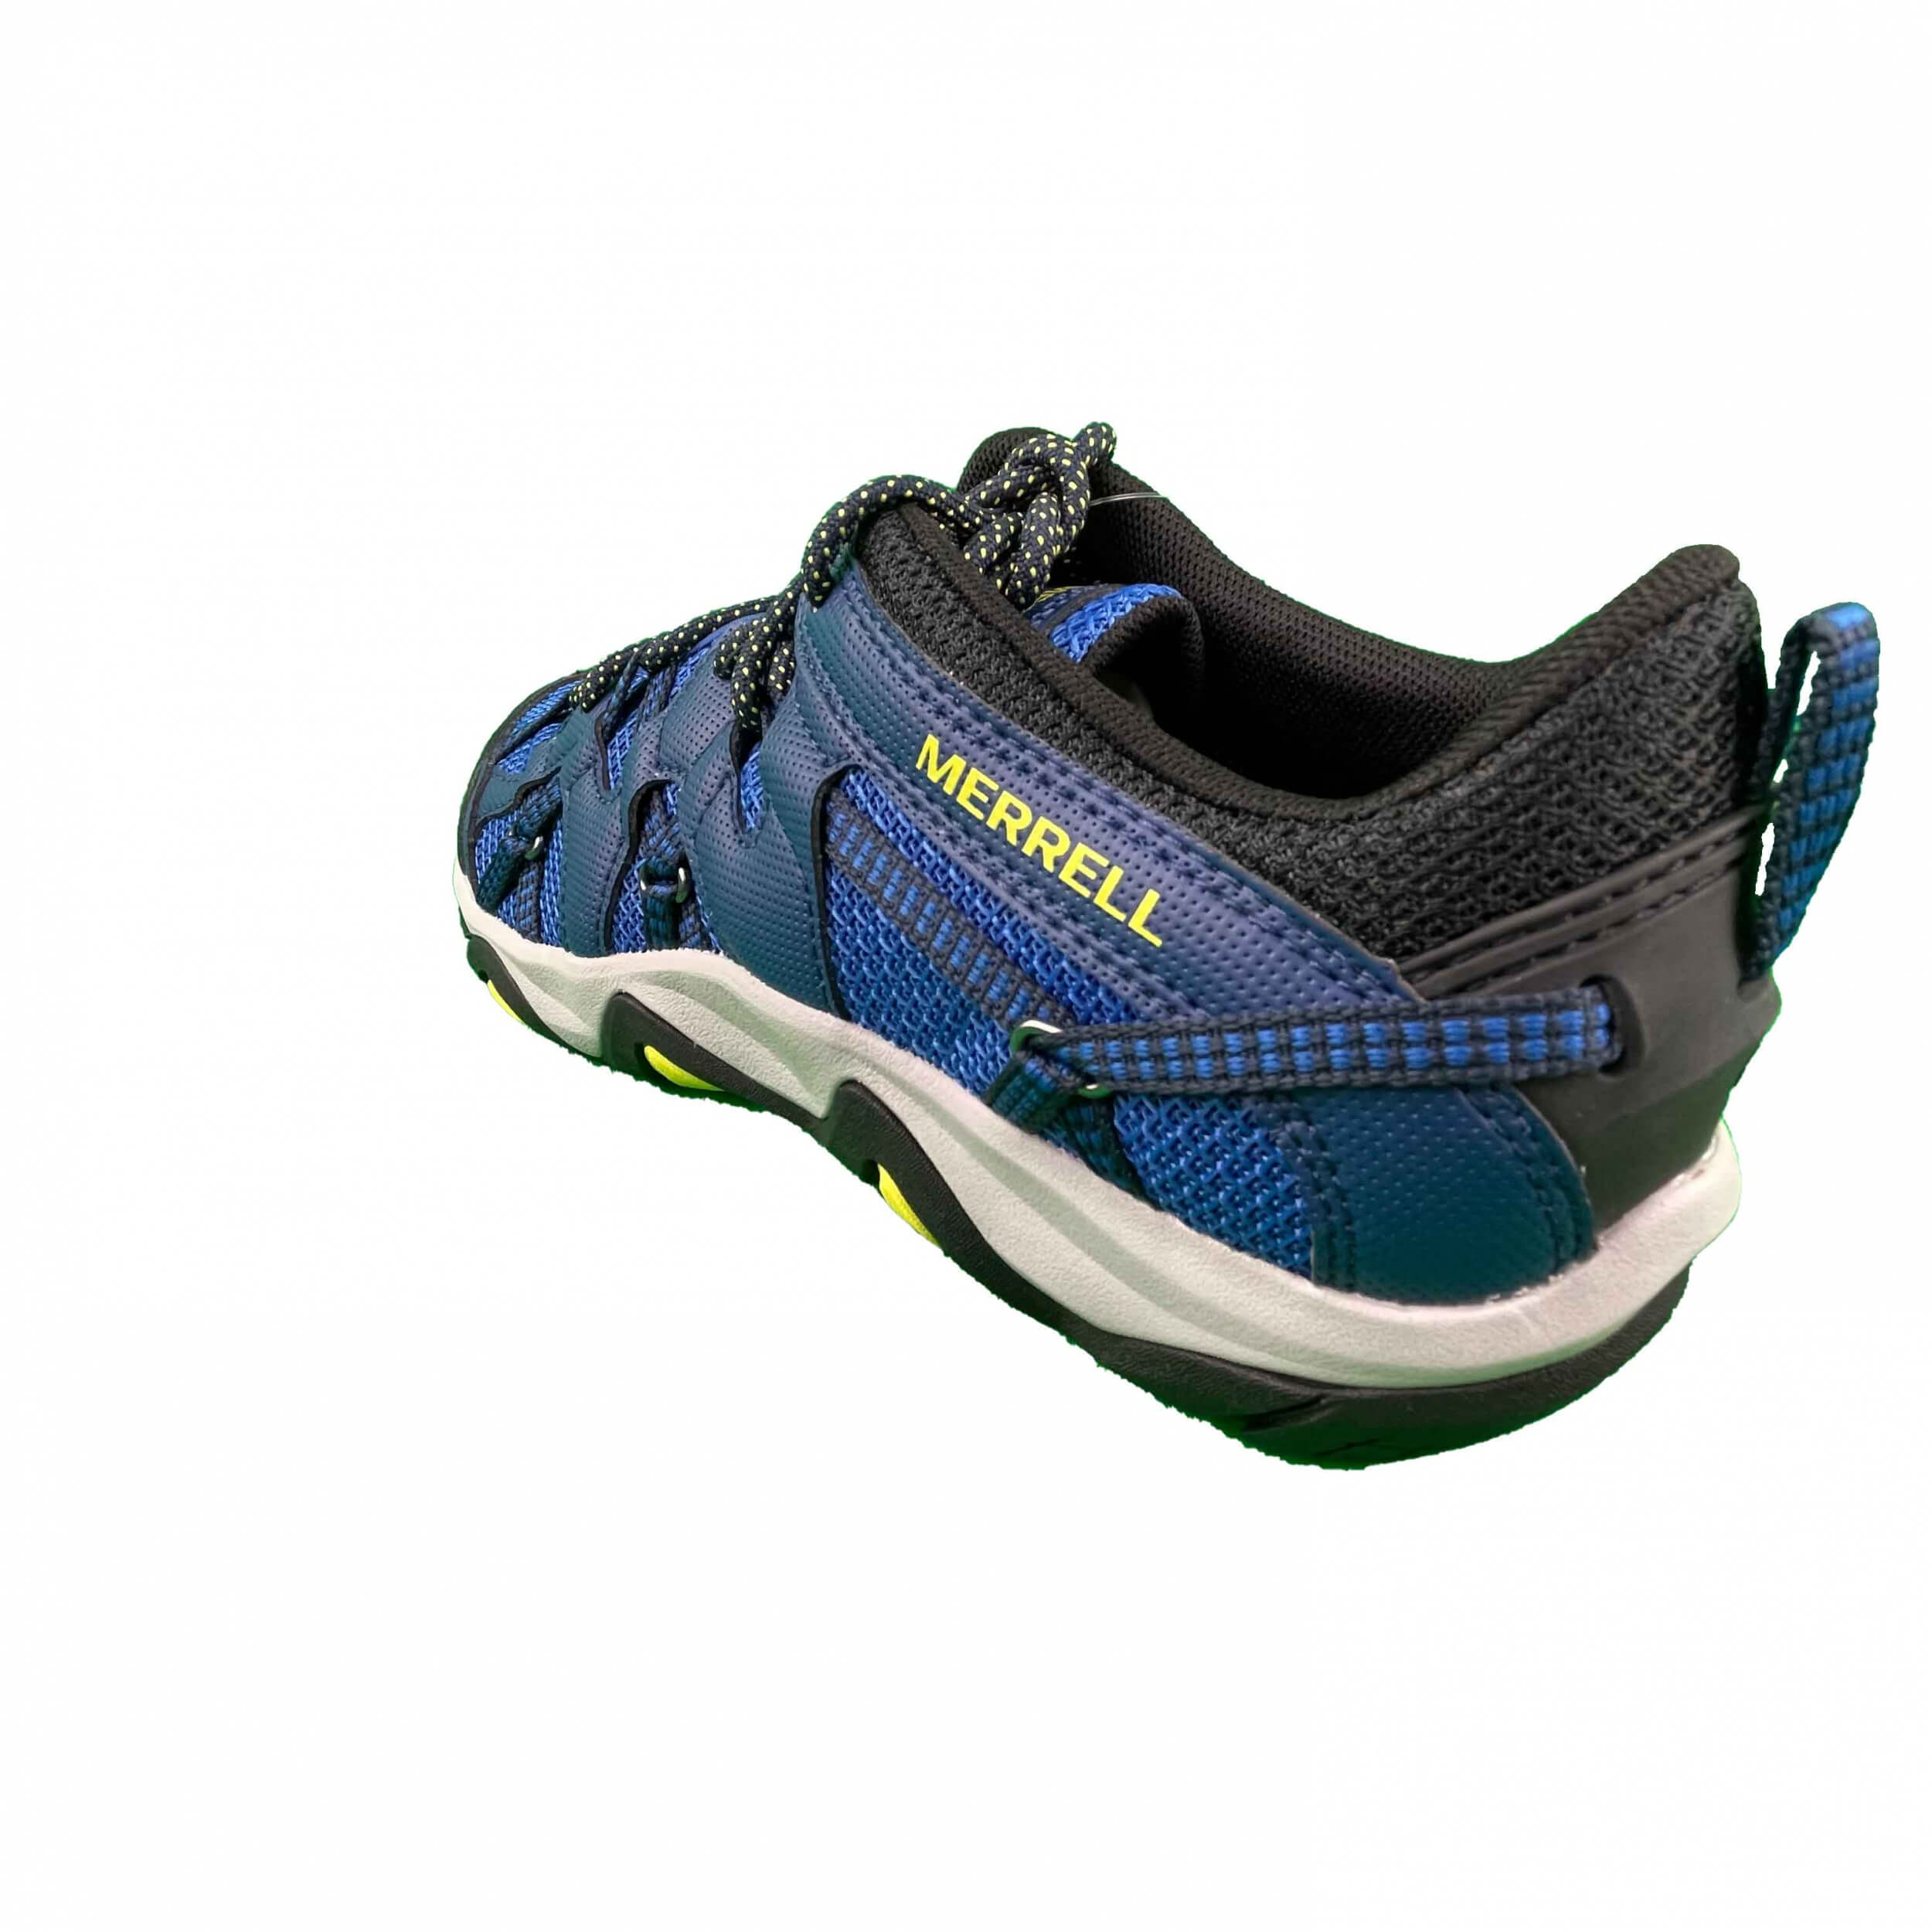 Merrell Schuhe Waterpro Ultrasport 2 M J036105 blau